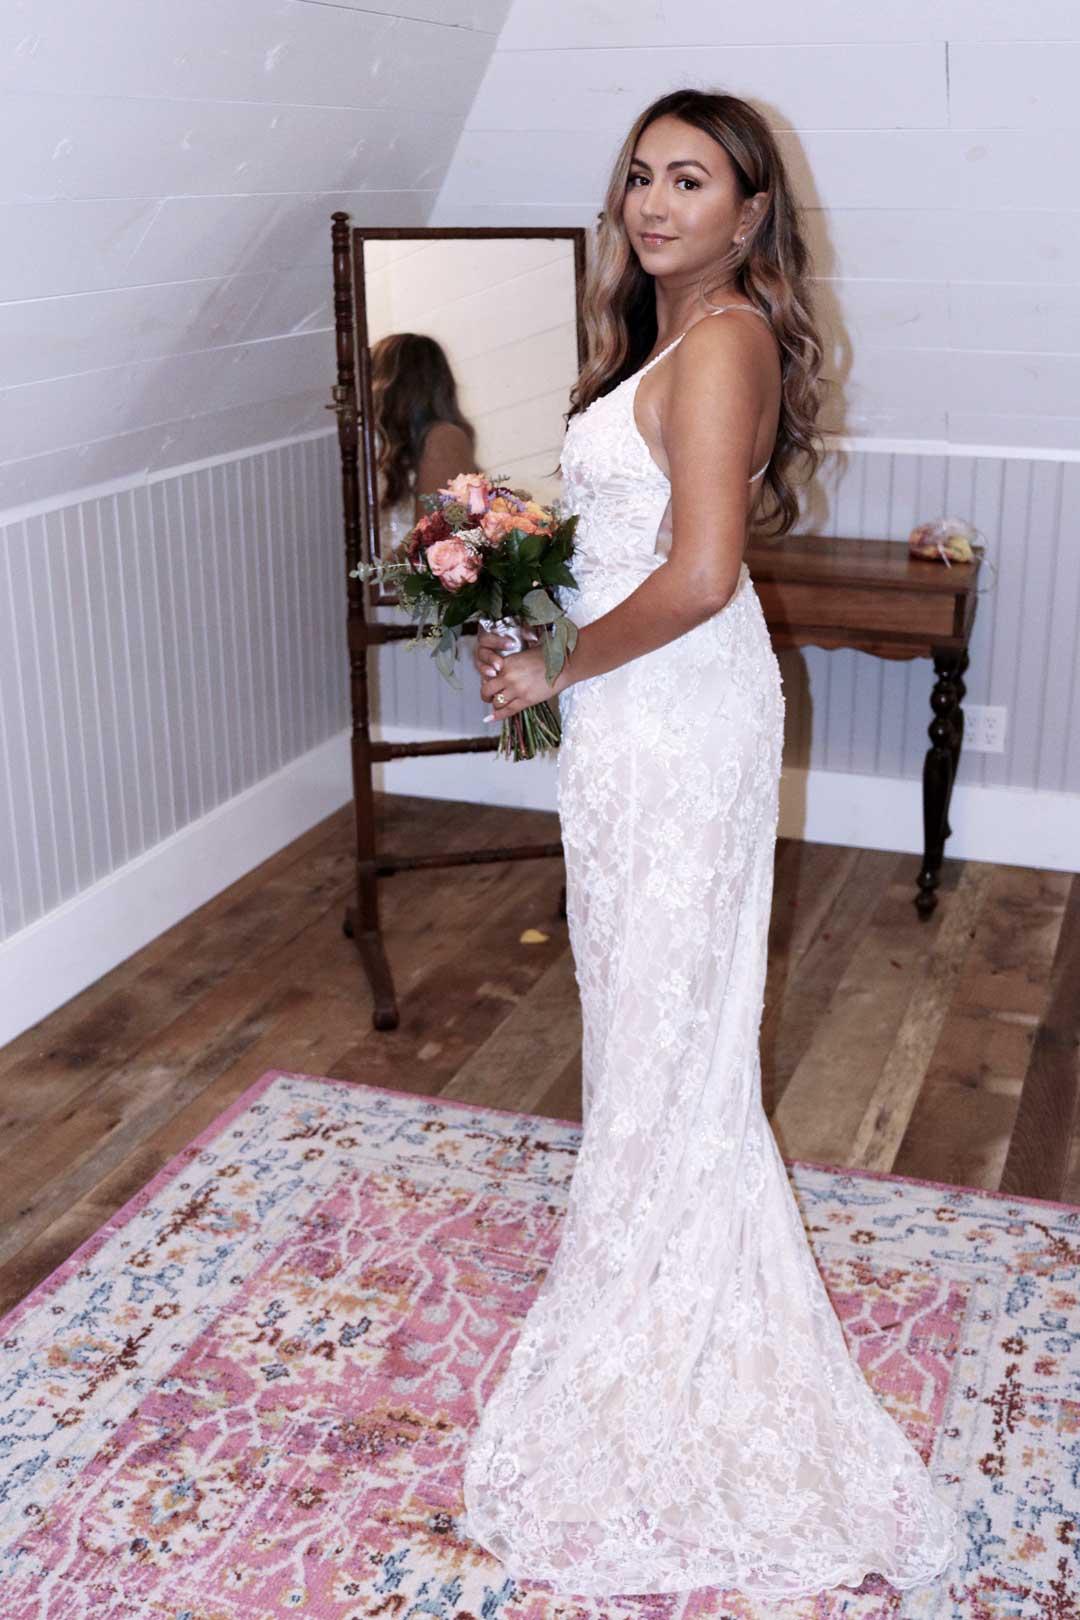 Zerona laser weight loss client in her wedding dress.